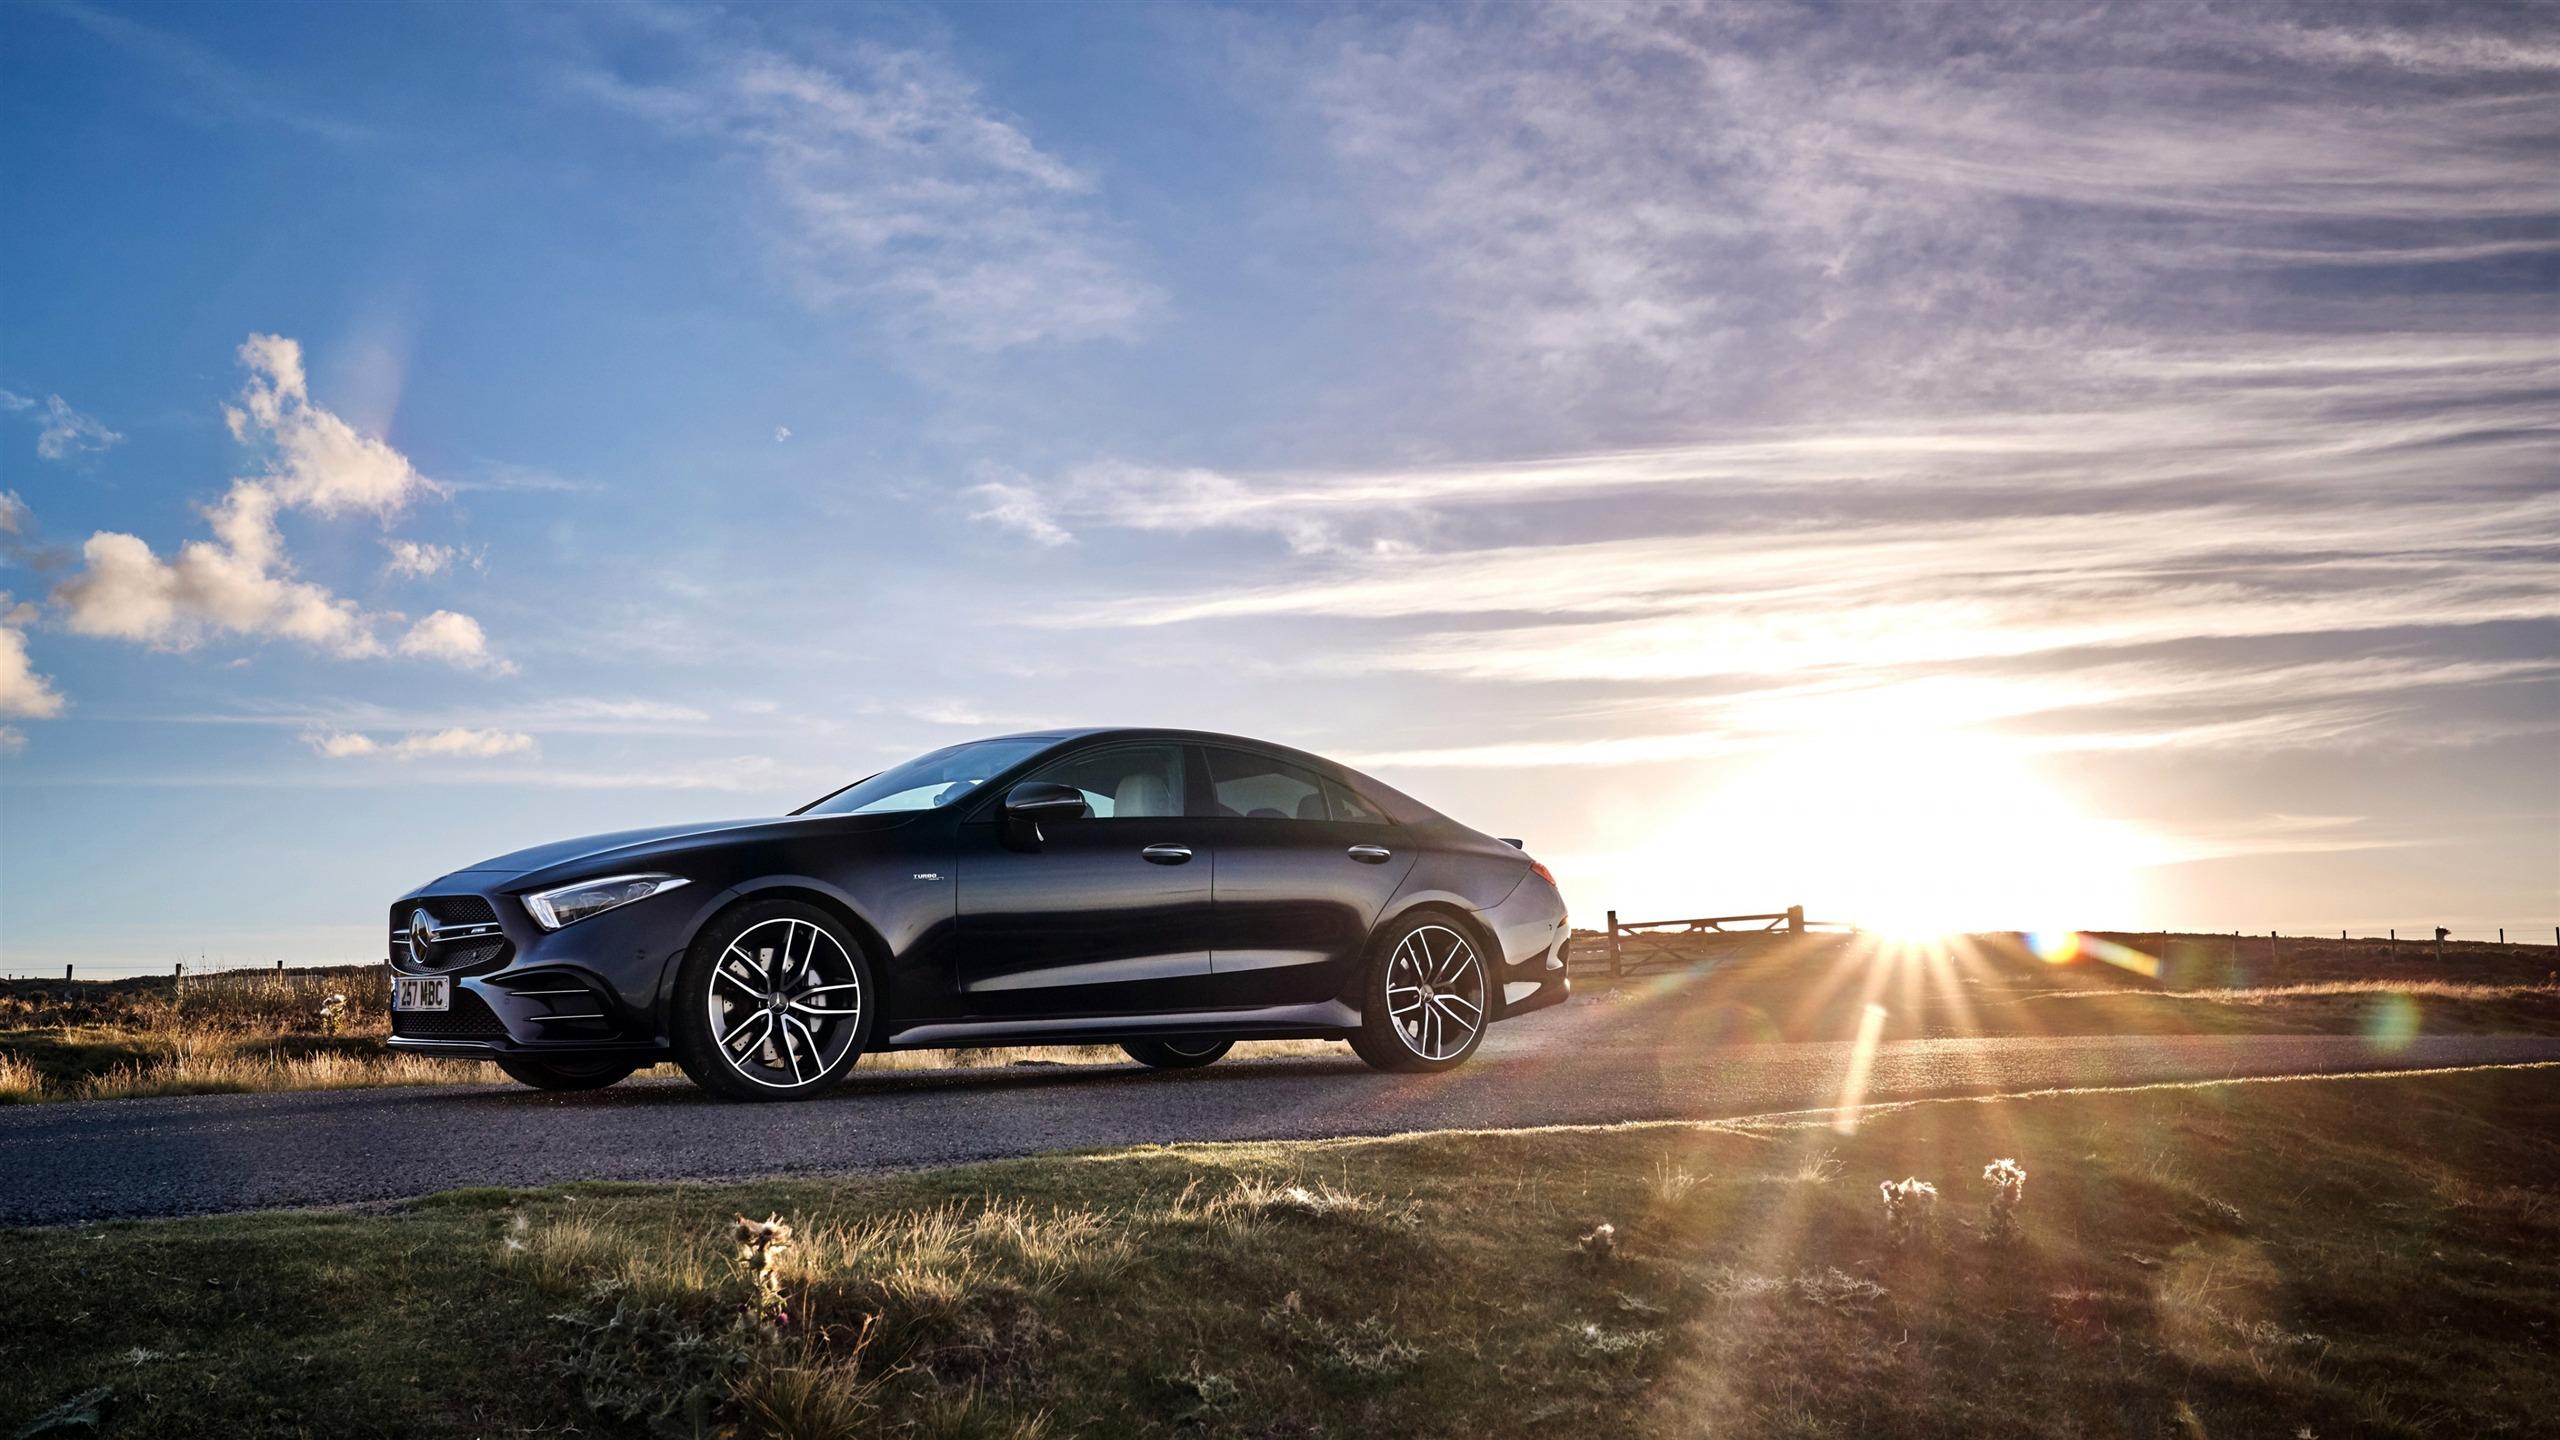 Mercedes Benz Amg >> 梅赛德斯奔驰,Cls,53,AMG,2019,广告预览 | 10wallpaper.com